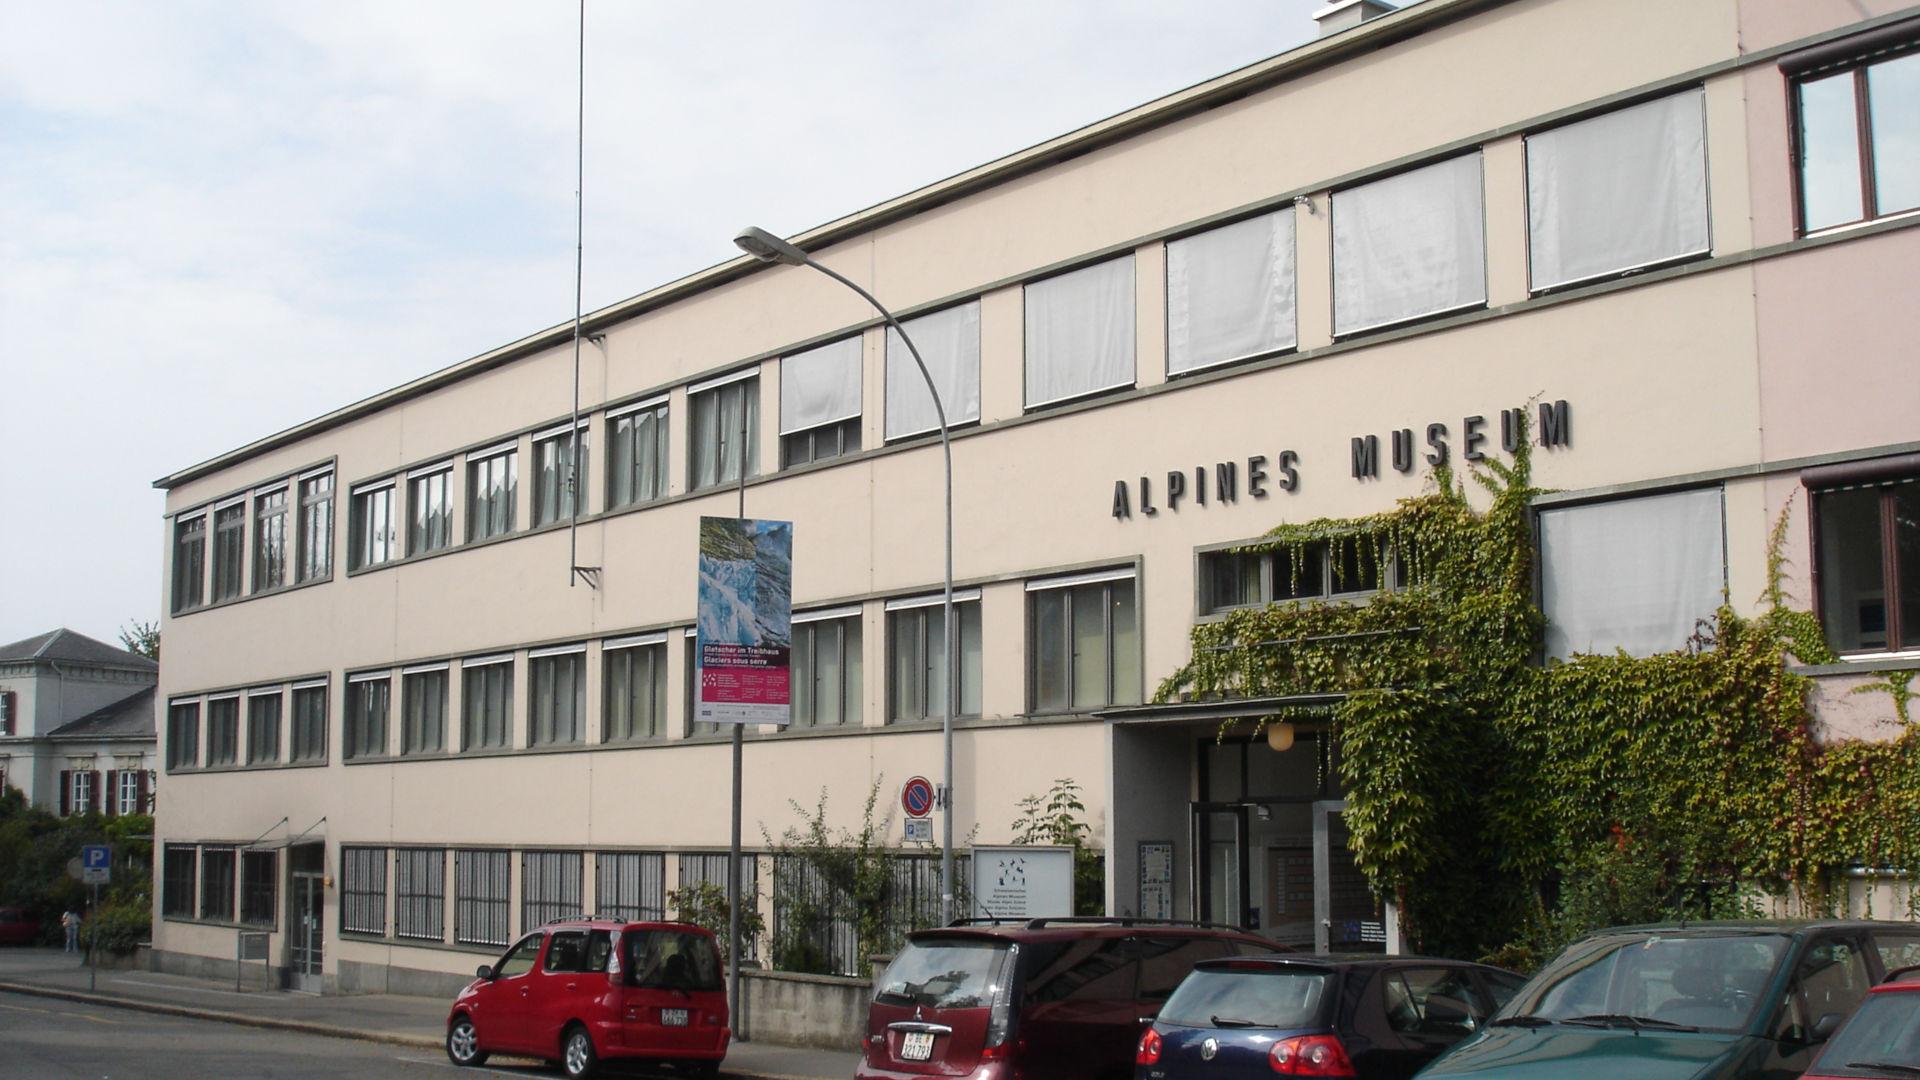 Bern, Alpines Museum